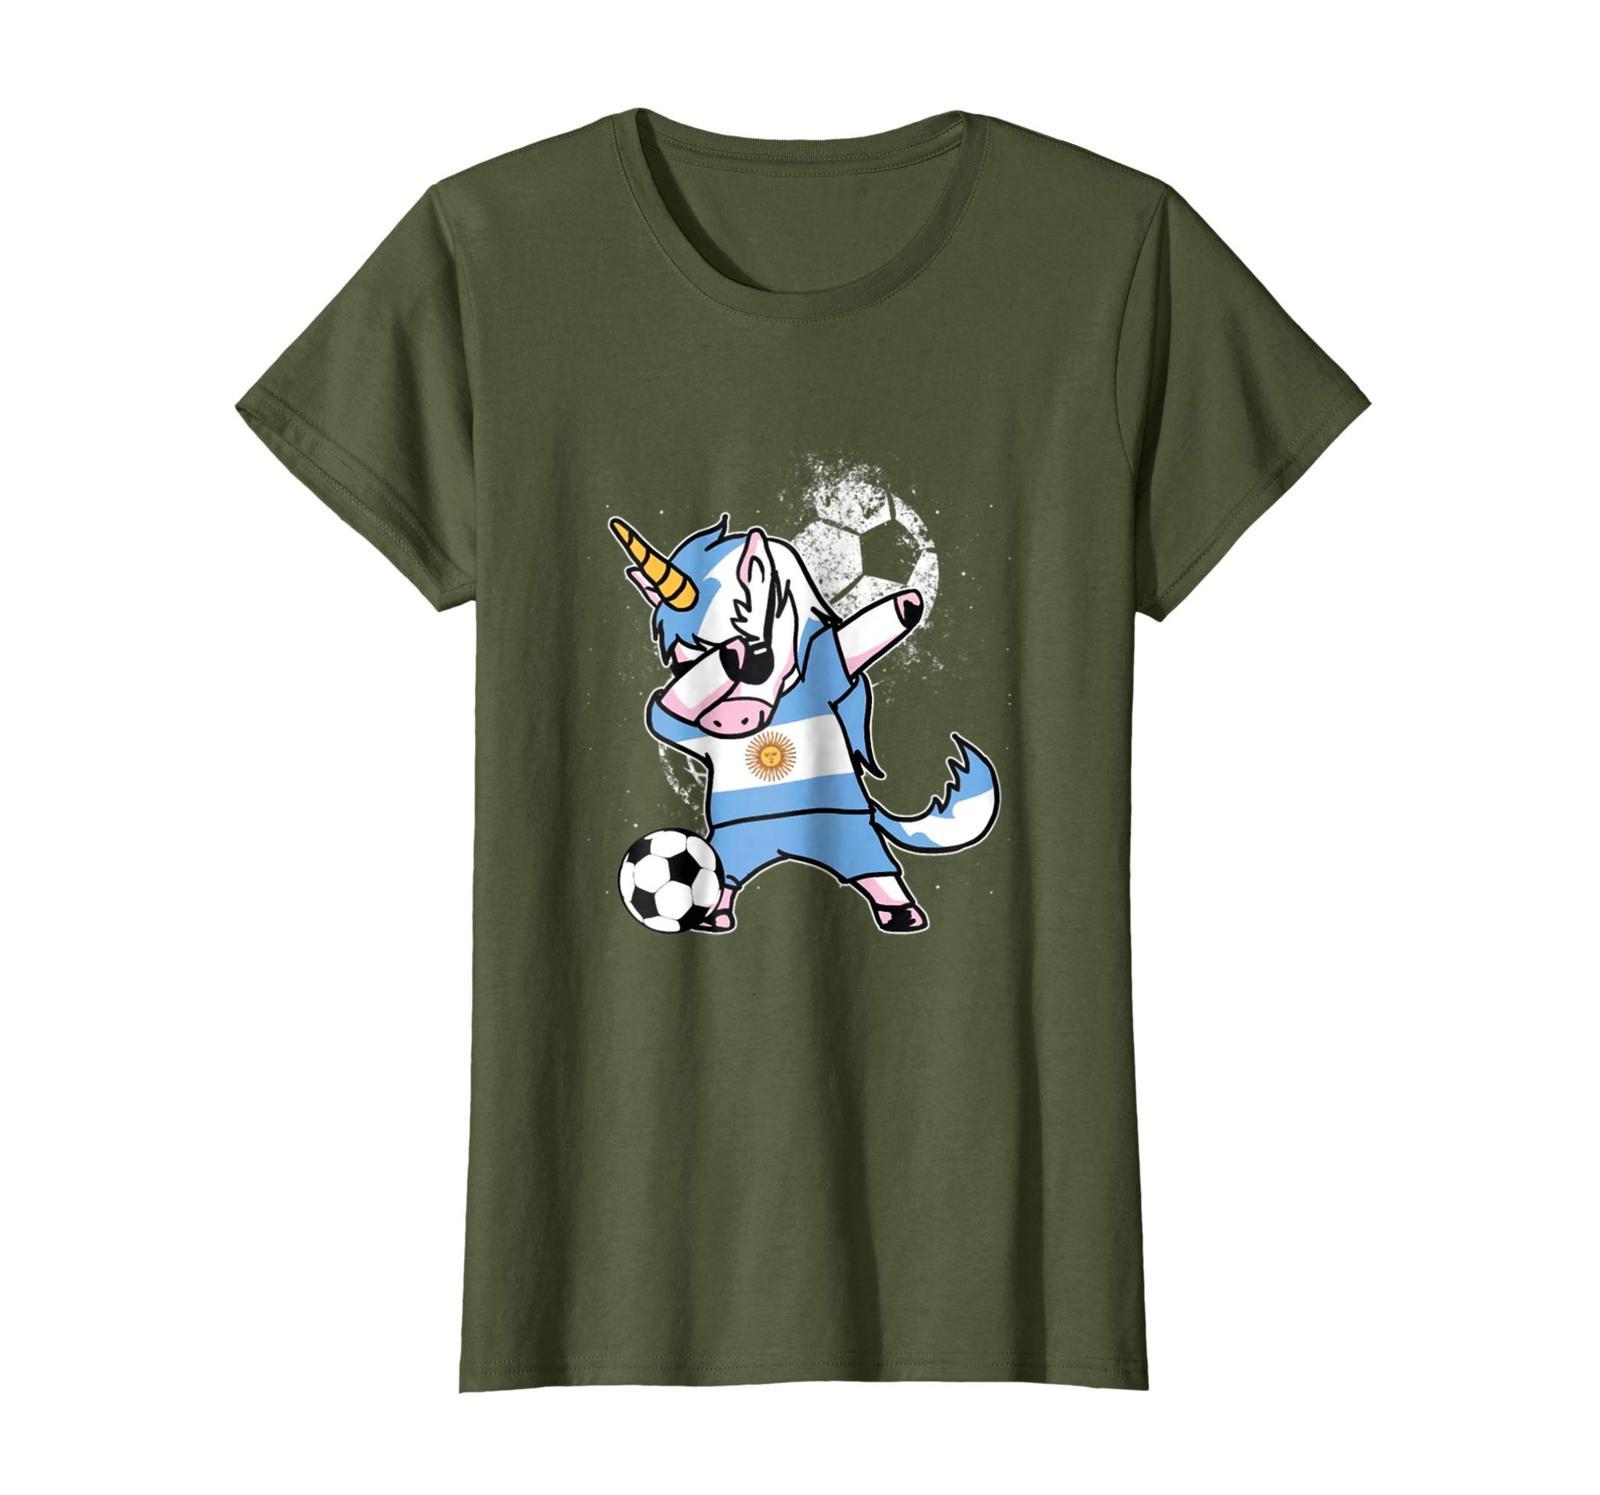 New Shirts - Dabbing Unicorn Argentina Football Cup 2018 Soccer T Shirt Wowen